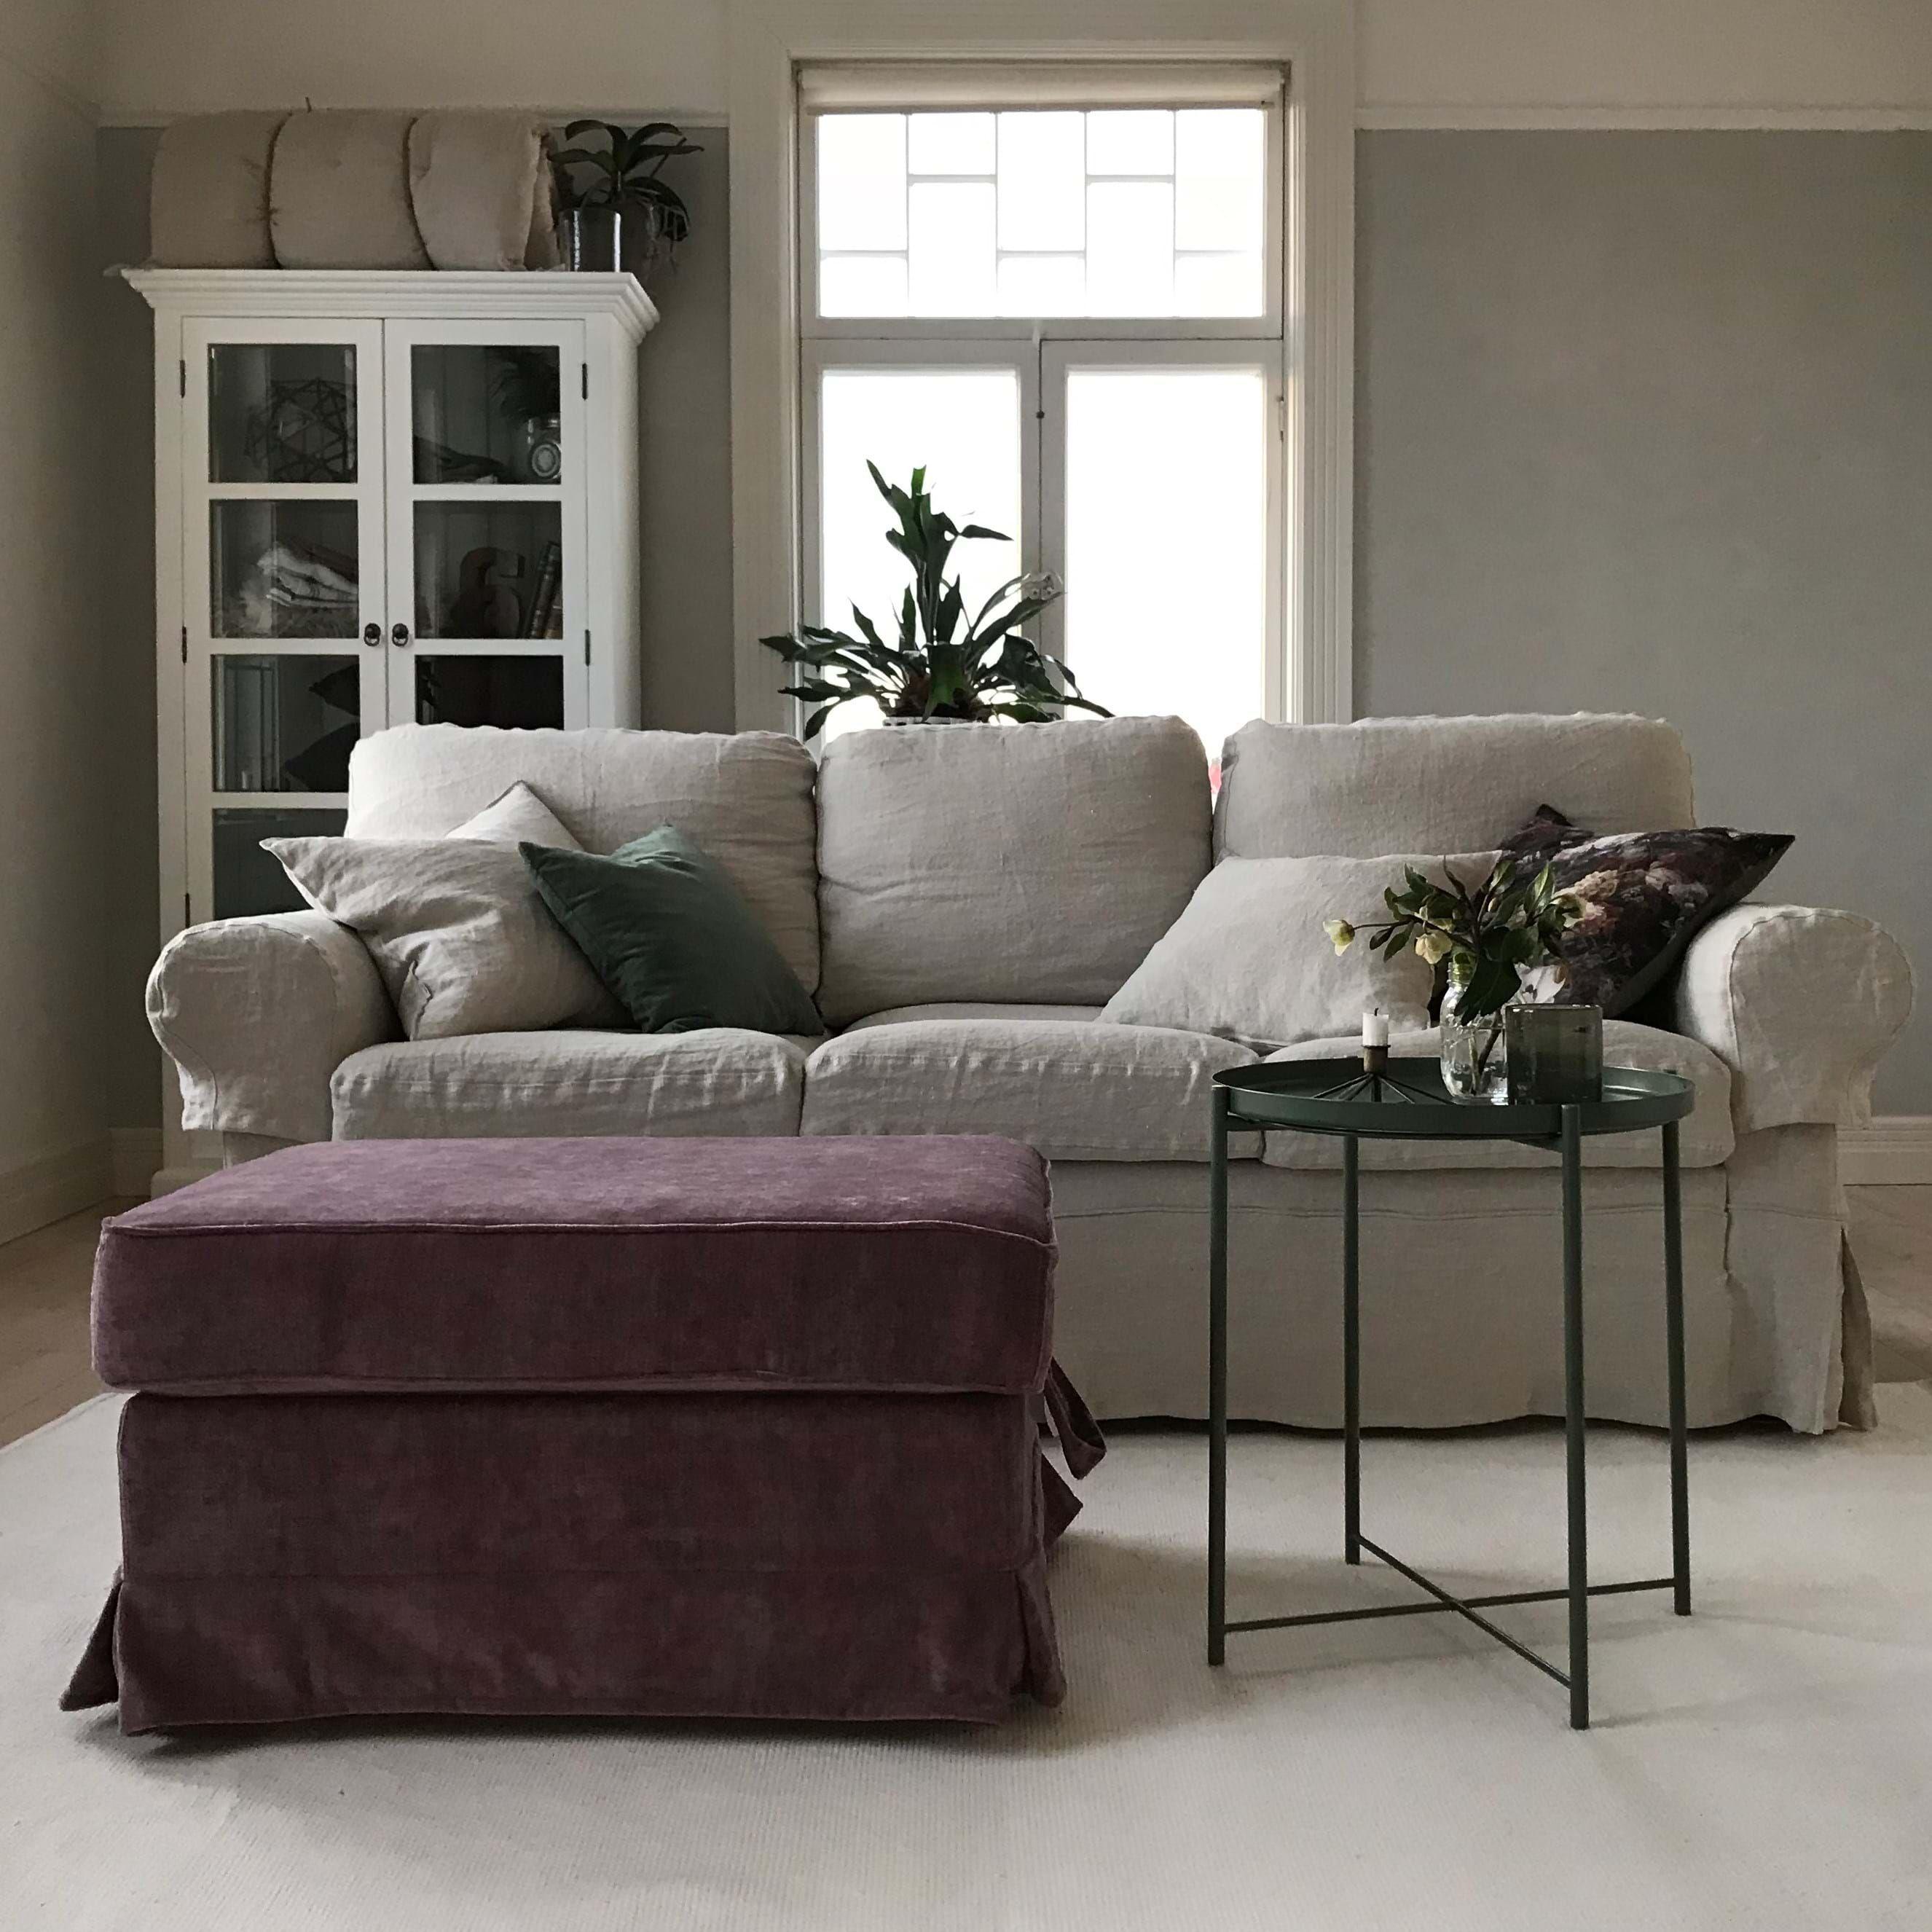 IKEA Ektorp sofa review by Bemz Bemz